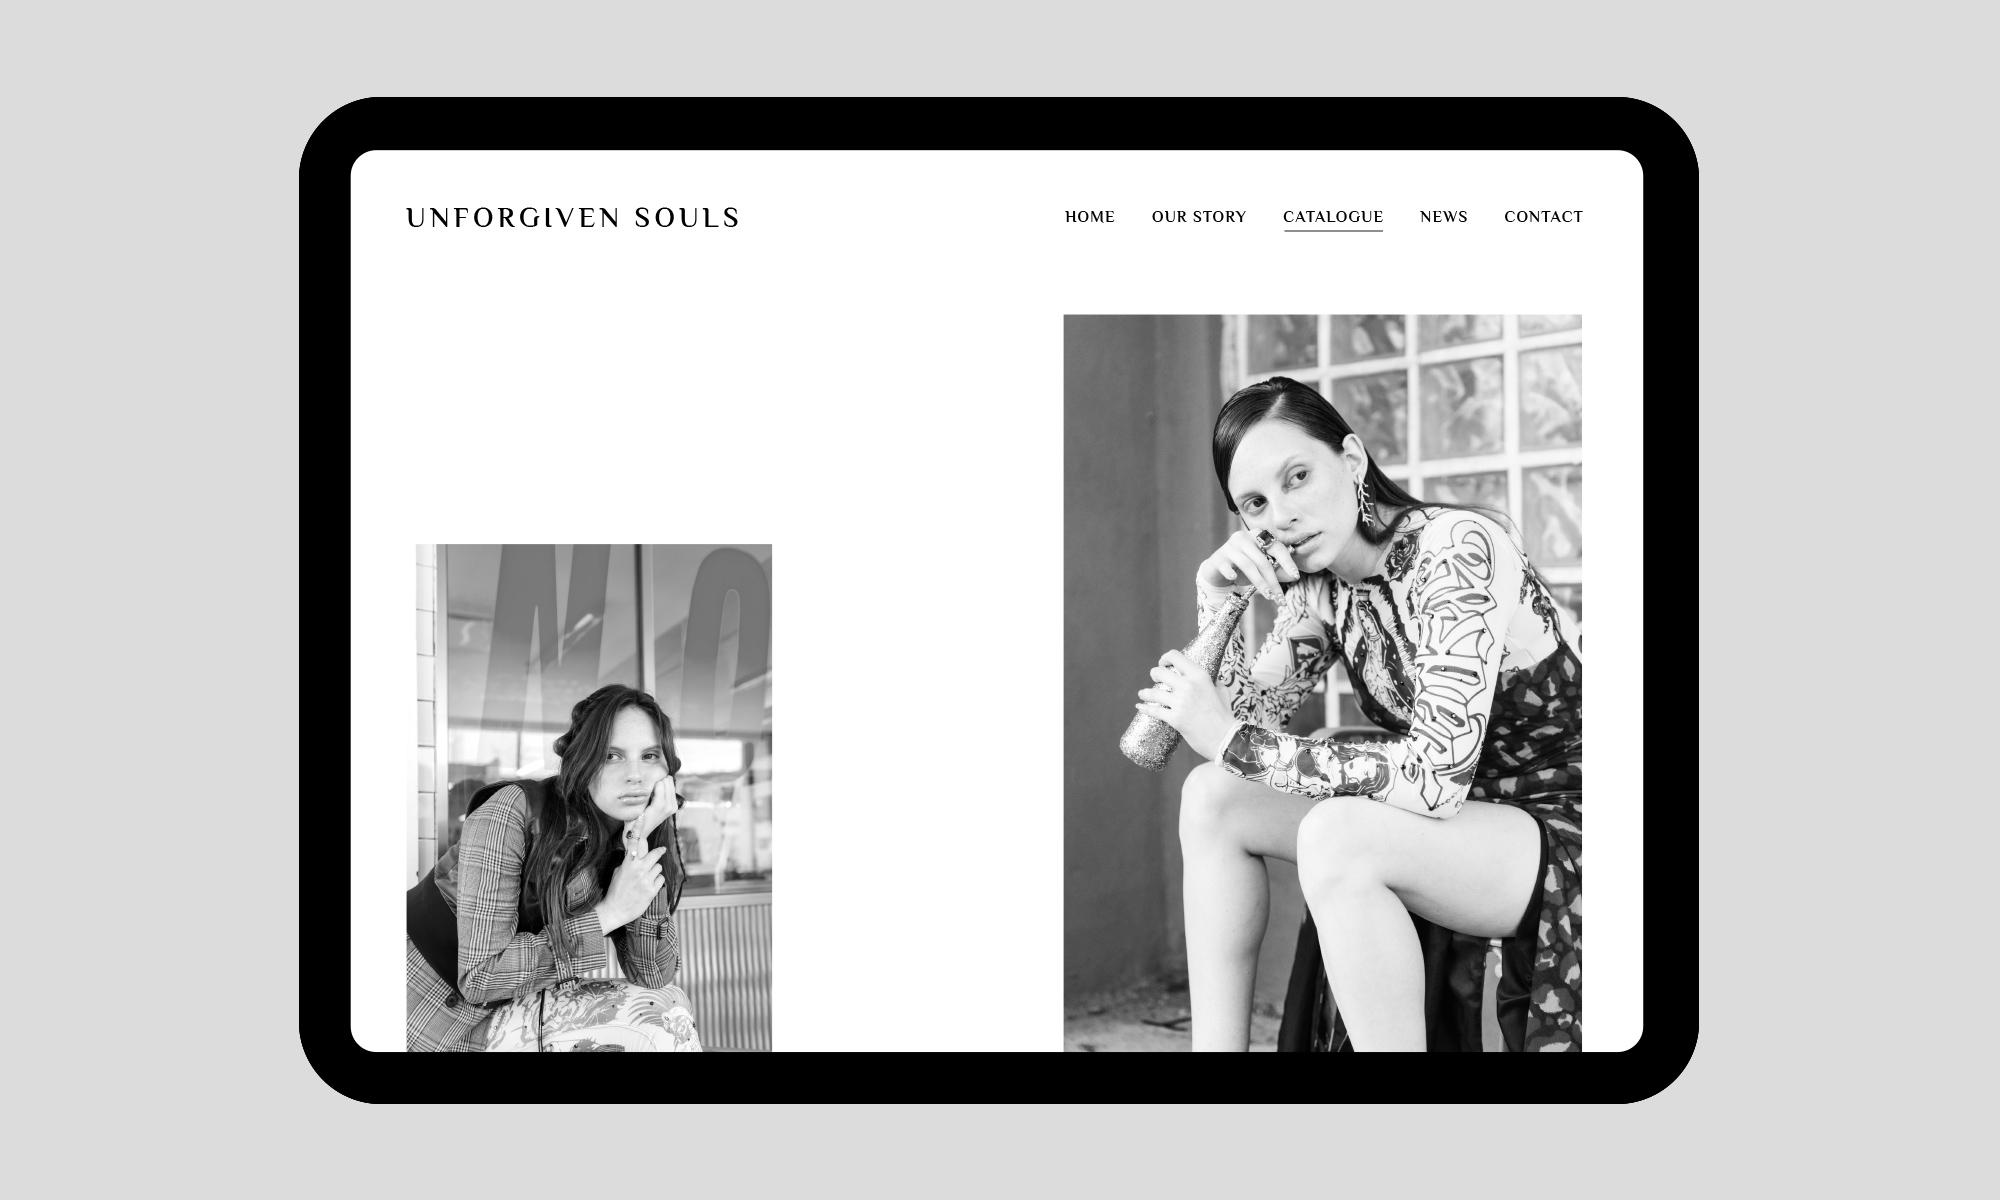 Unforgiven Souls website